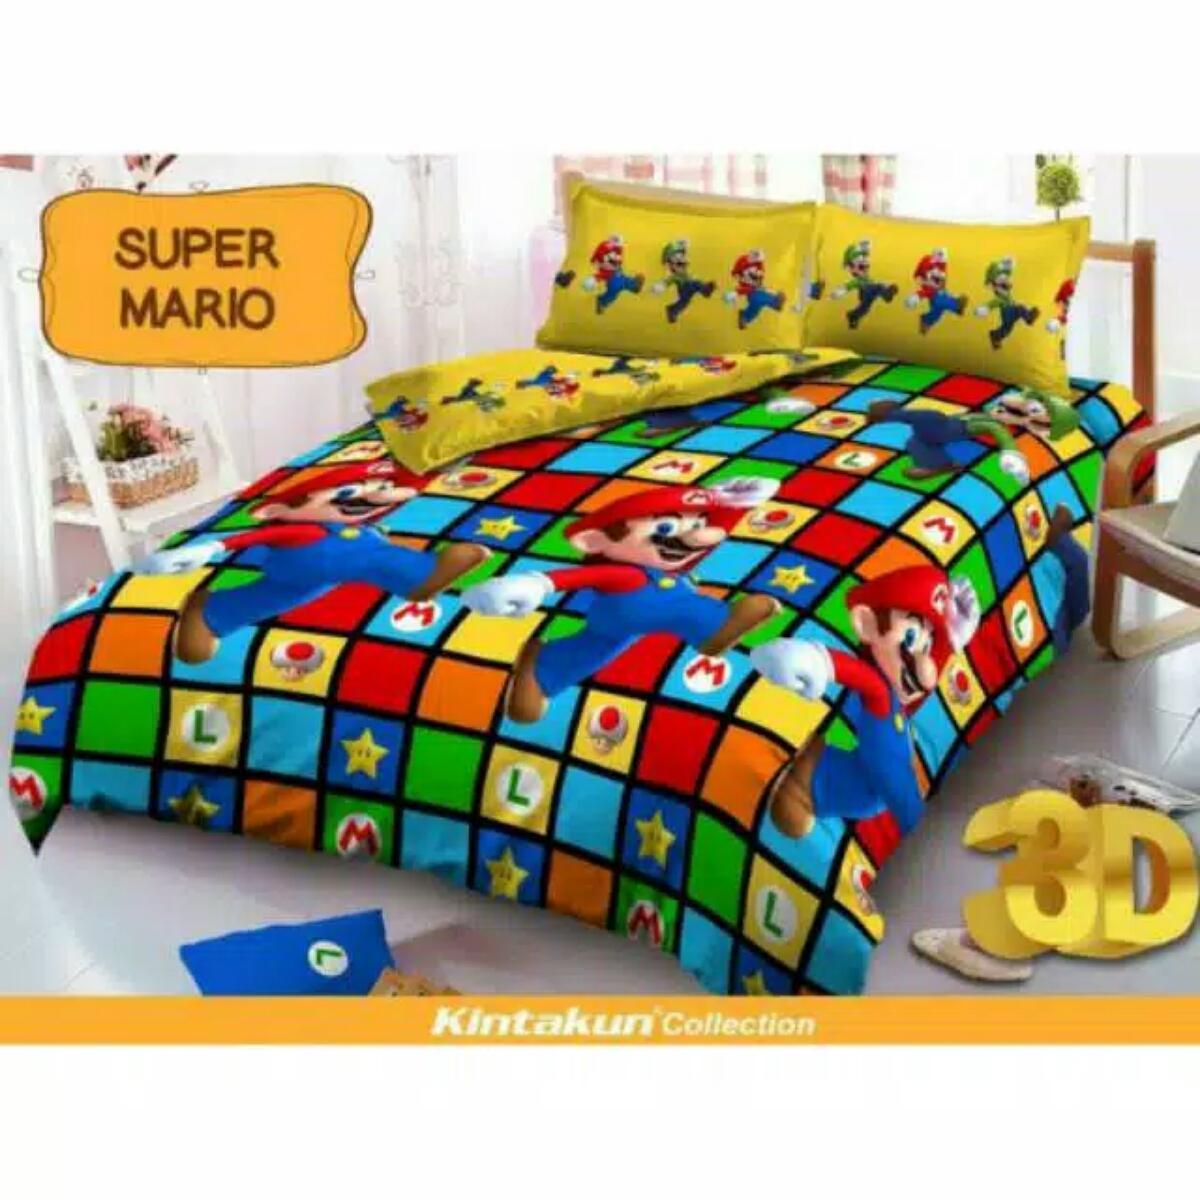 Sprei Murahn Bedcover Dluxe Kintakun Ukuran 180 X 200 Pisano Cek 120 Single Uk180 Motif Super Mario